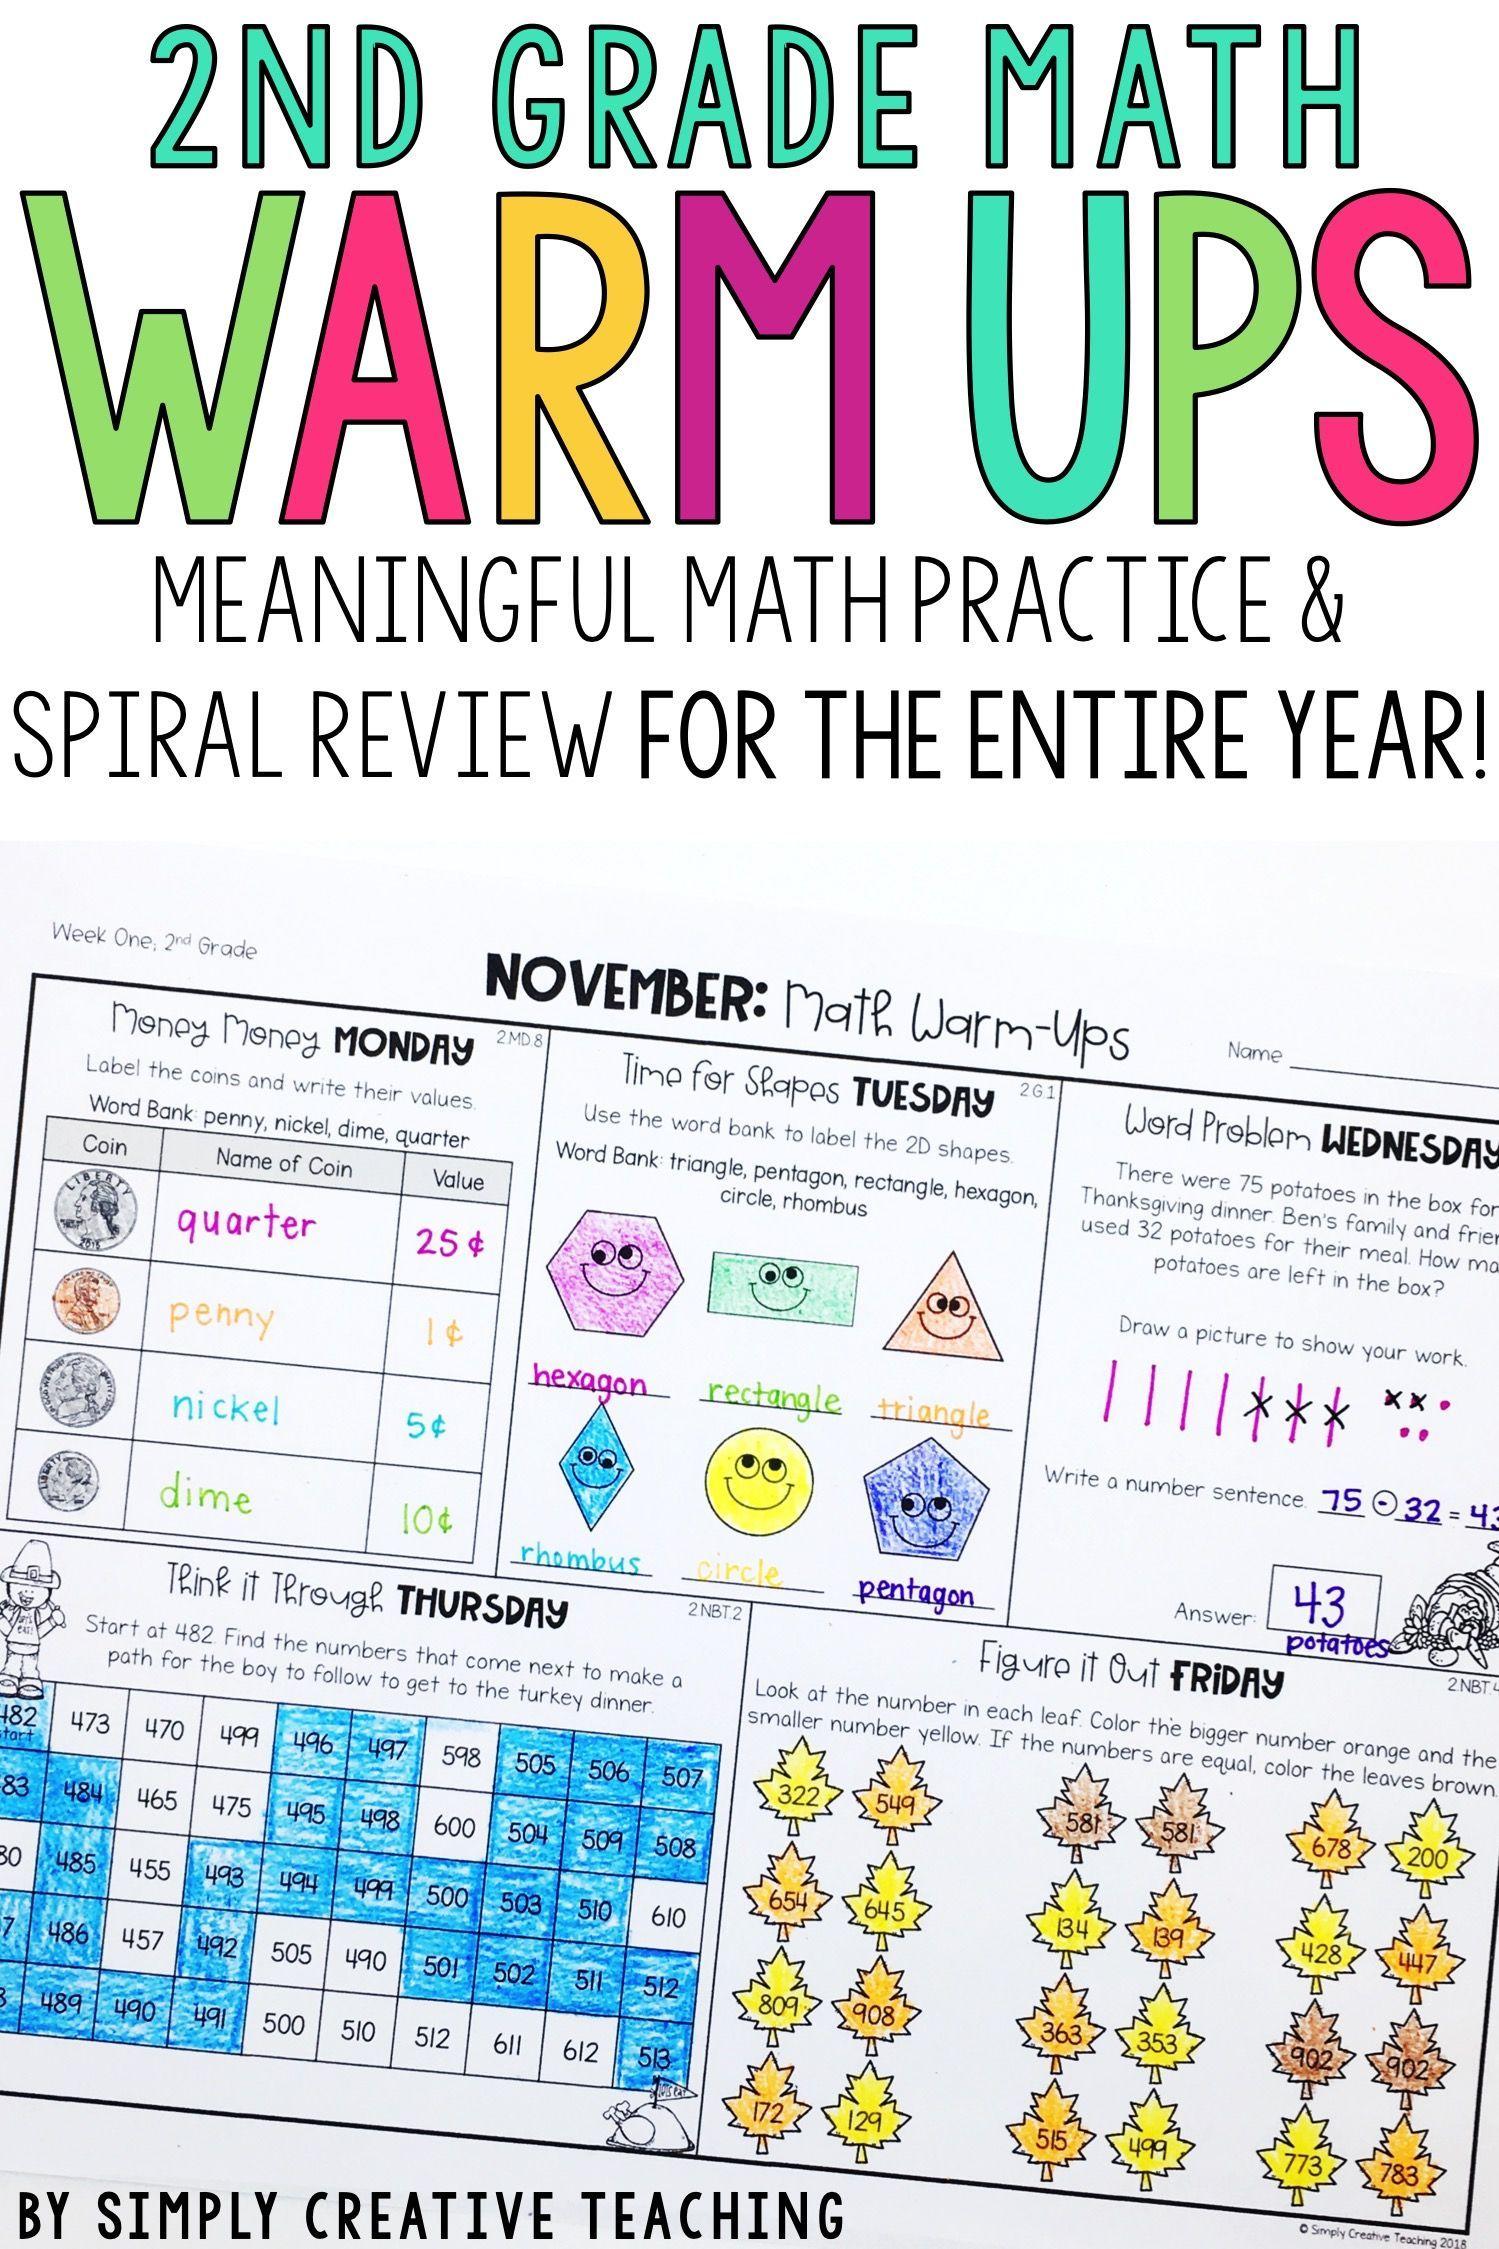 2nd Grade Weekly Math Warm Ups Amp Daily Spiral Review